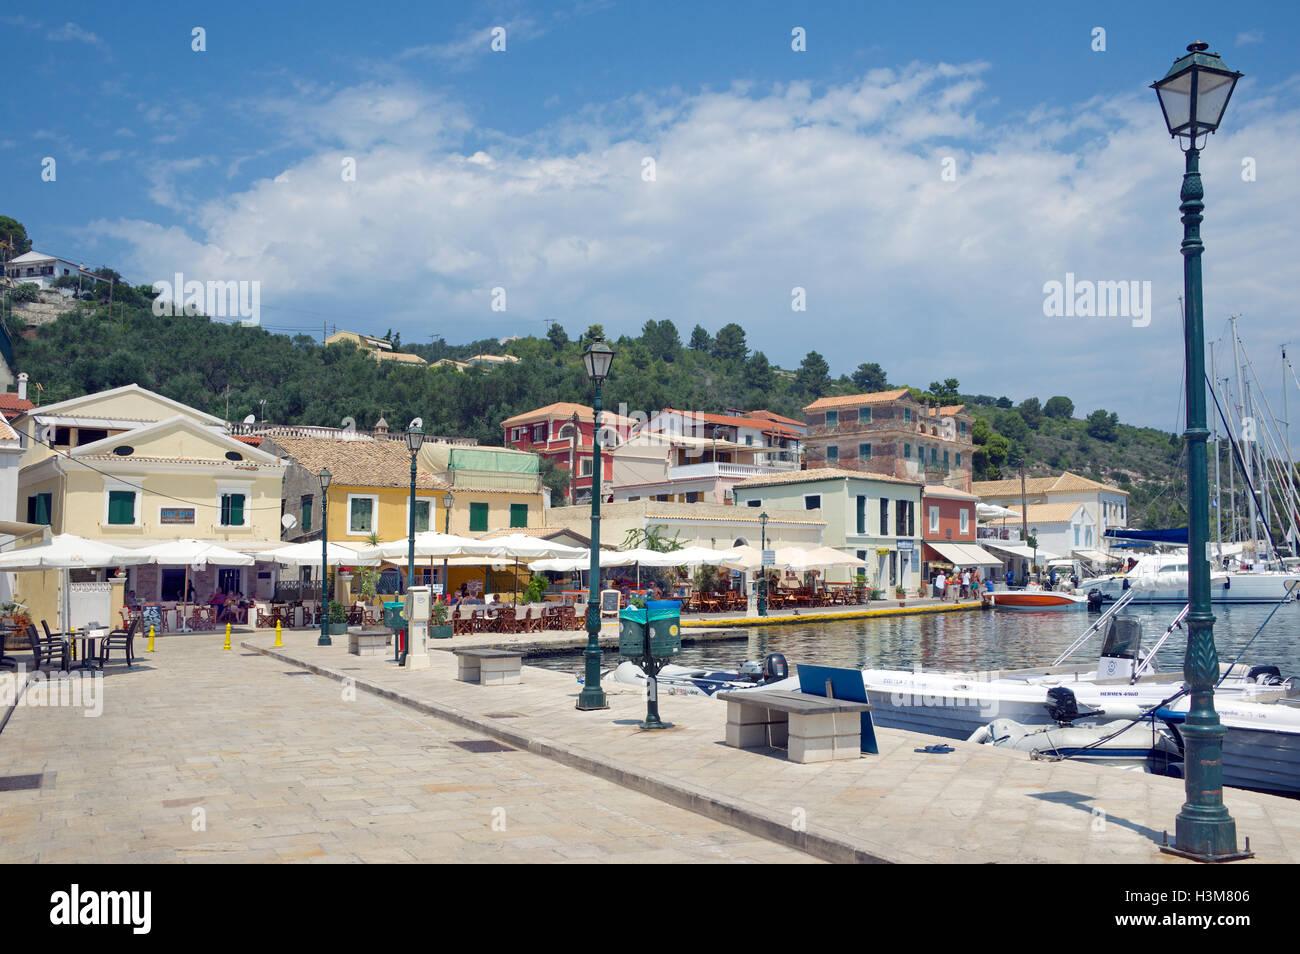 Waterfront buildings and promenade Gaios port Paxos Ionian Islands Greece - Stock Image